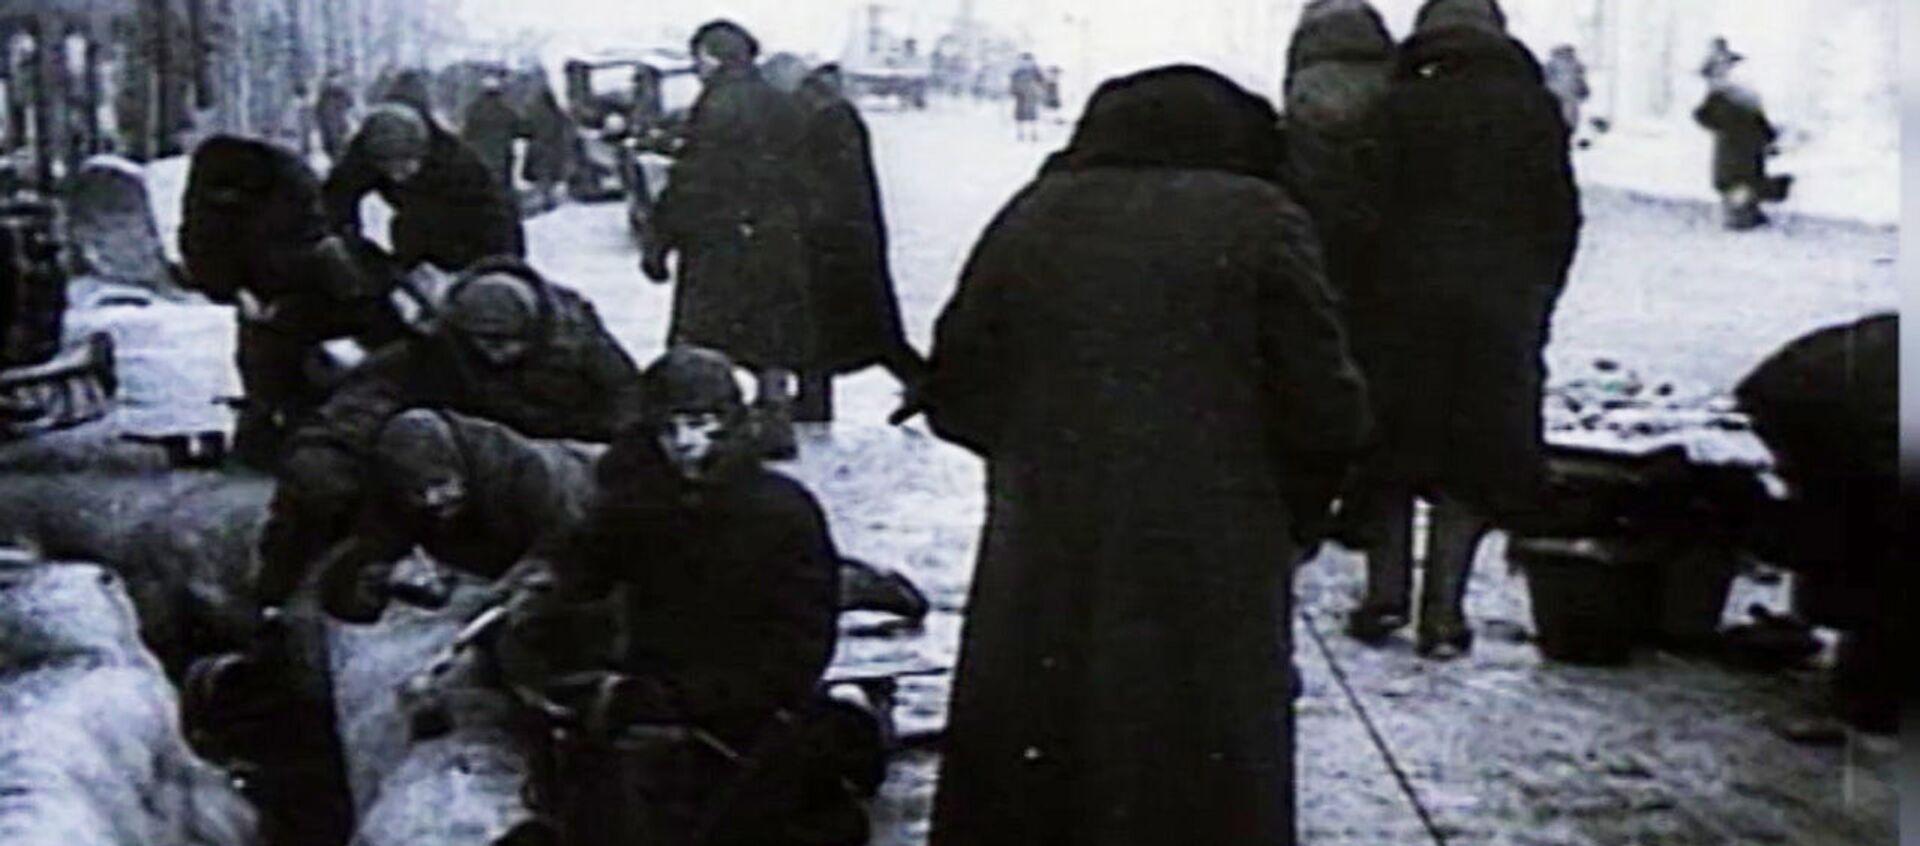 СПУТНИК_Начало блокады Ленинграда - Sputnik Узбекистан, 1920, 08.09.2018